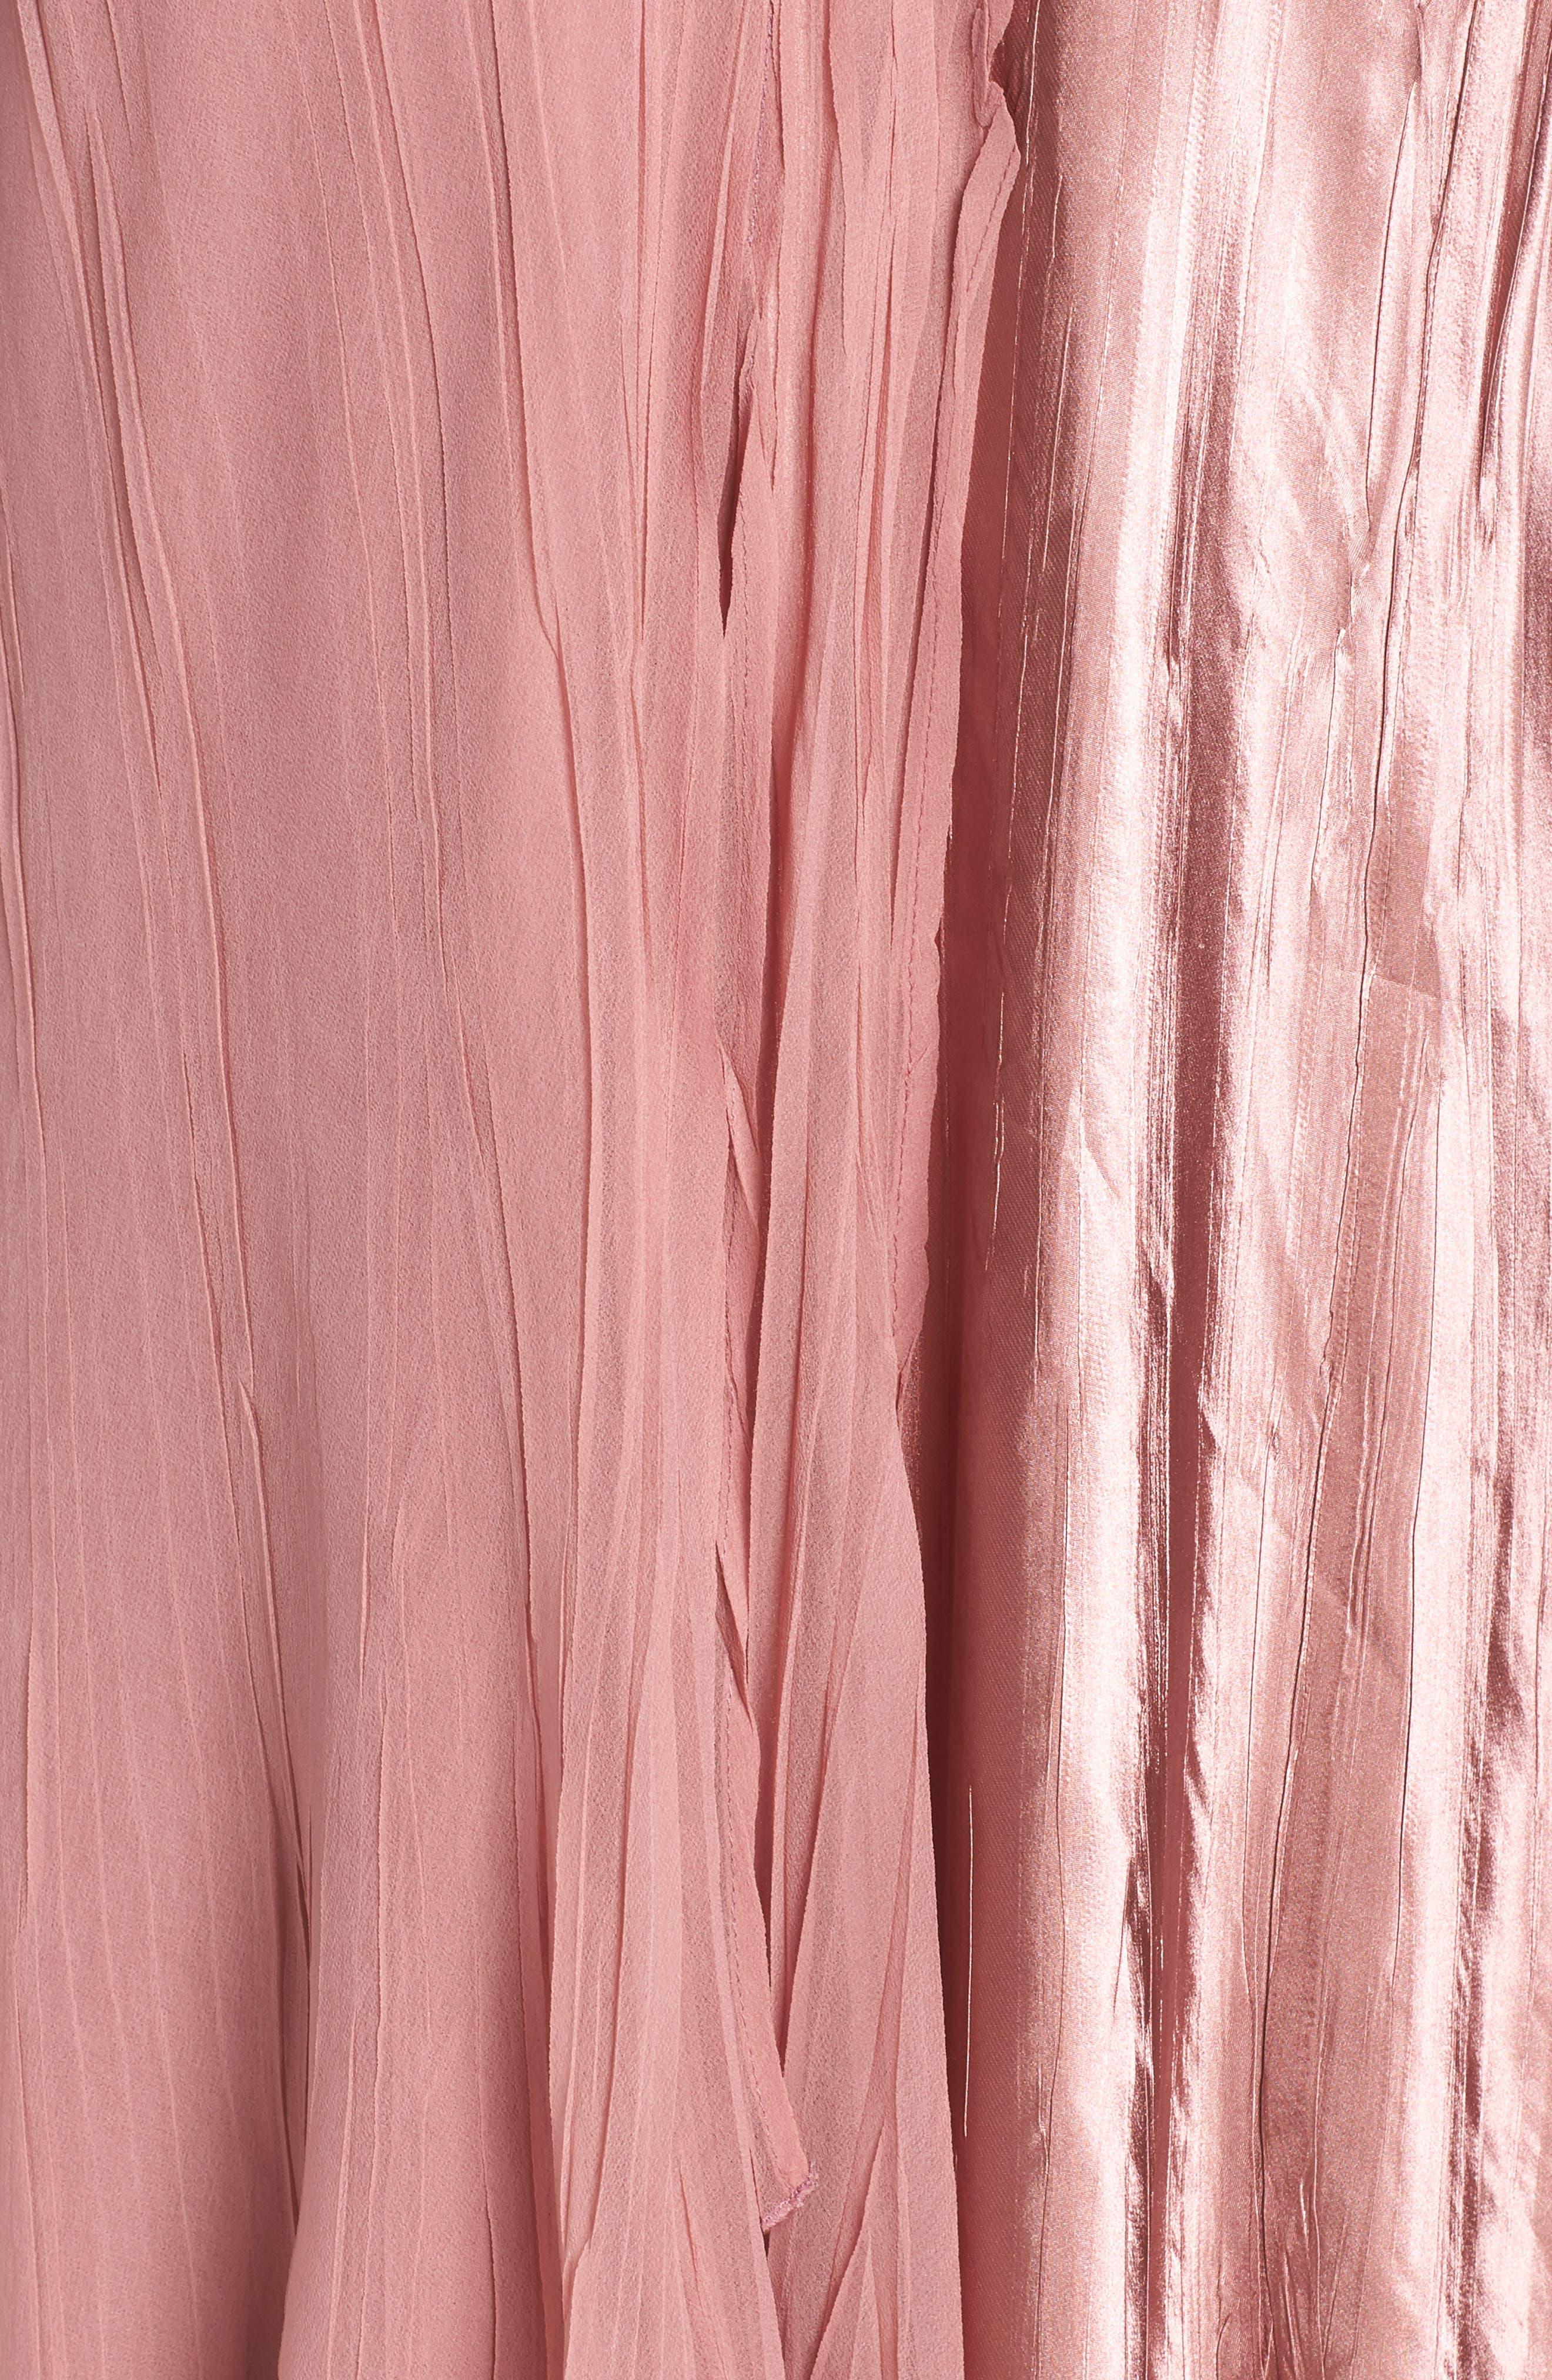 KOMAROV, Tiered A-Line Dress, Alternate thumbnail 6, color, 680